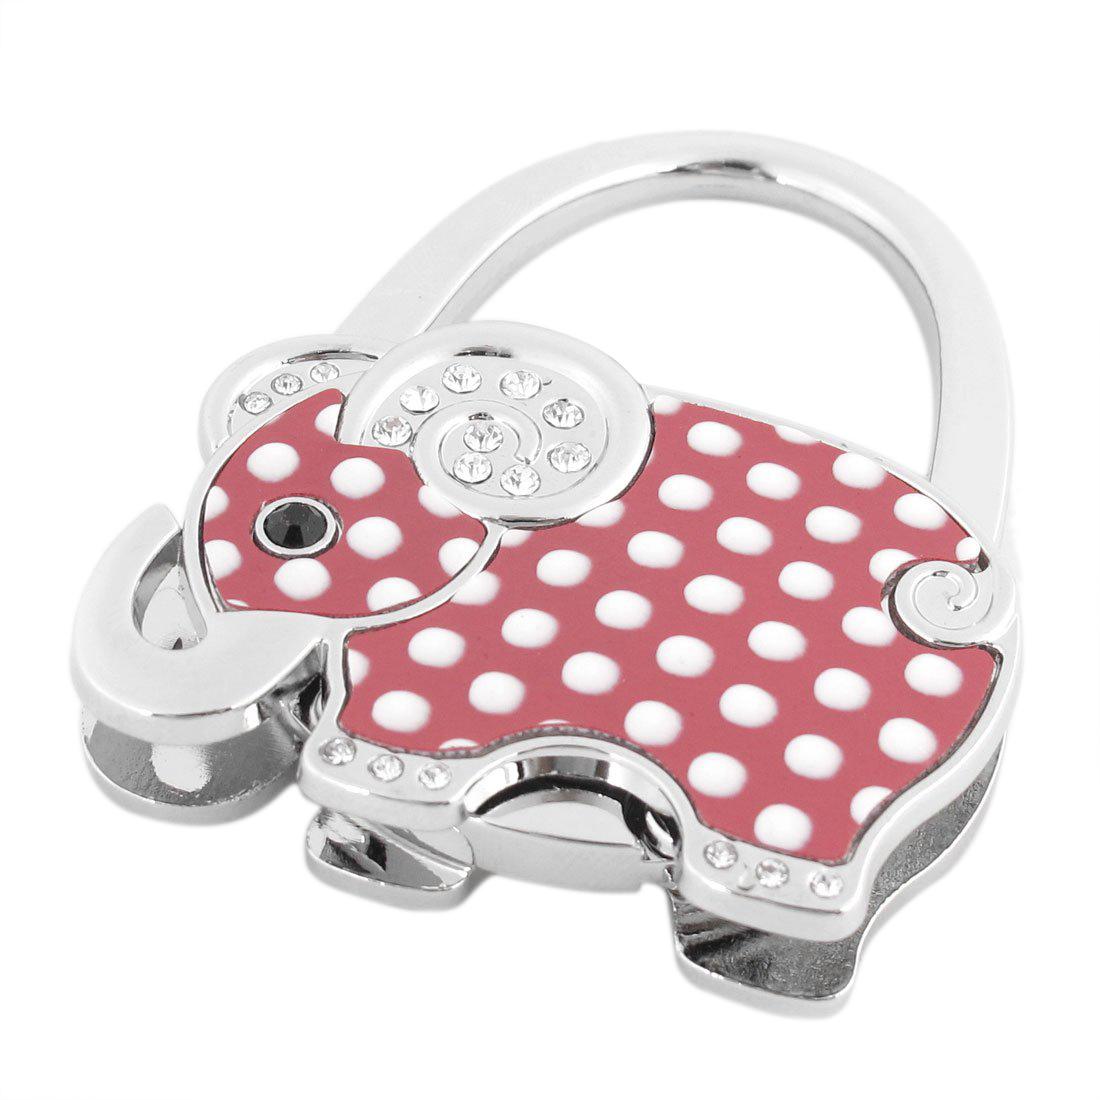 VSEN Hot White Dots Print Elephant Decor Foldable Purse Handbag Hook Decoration for Lady(China (Mainland))